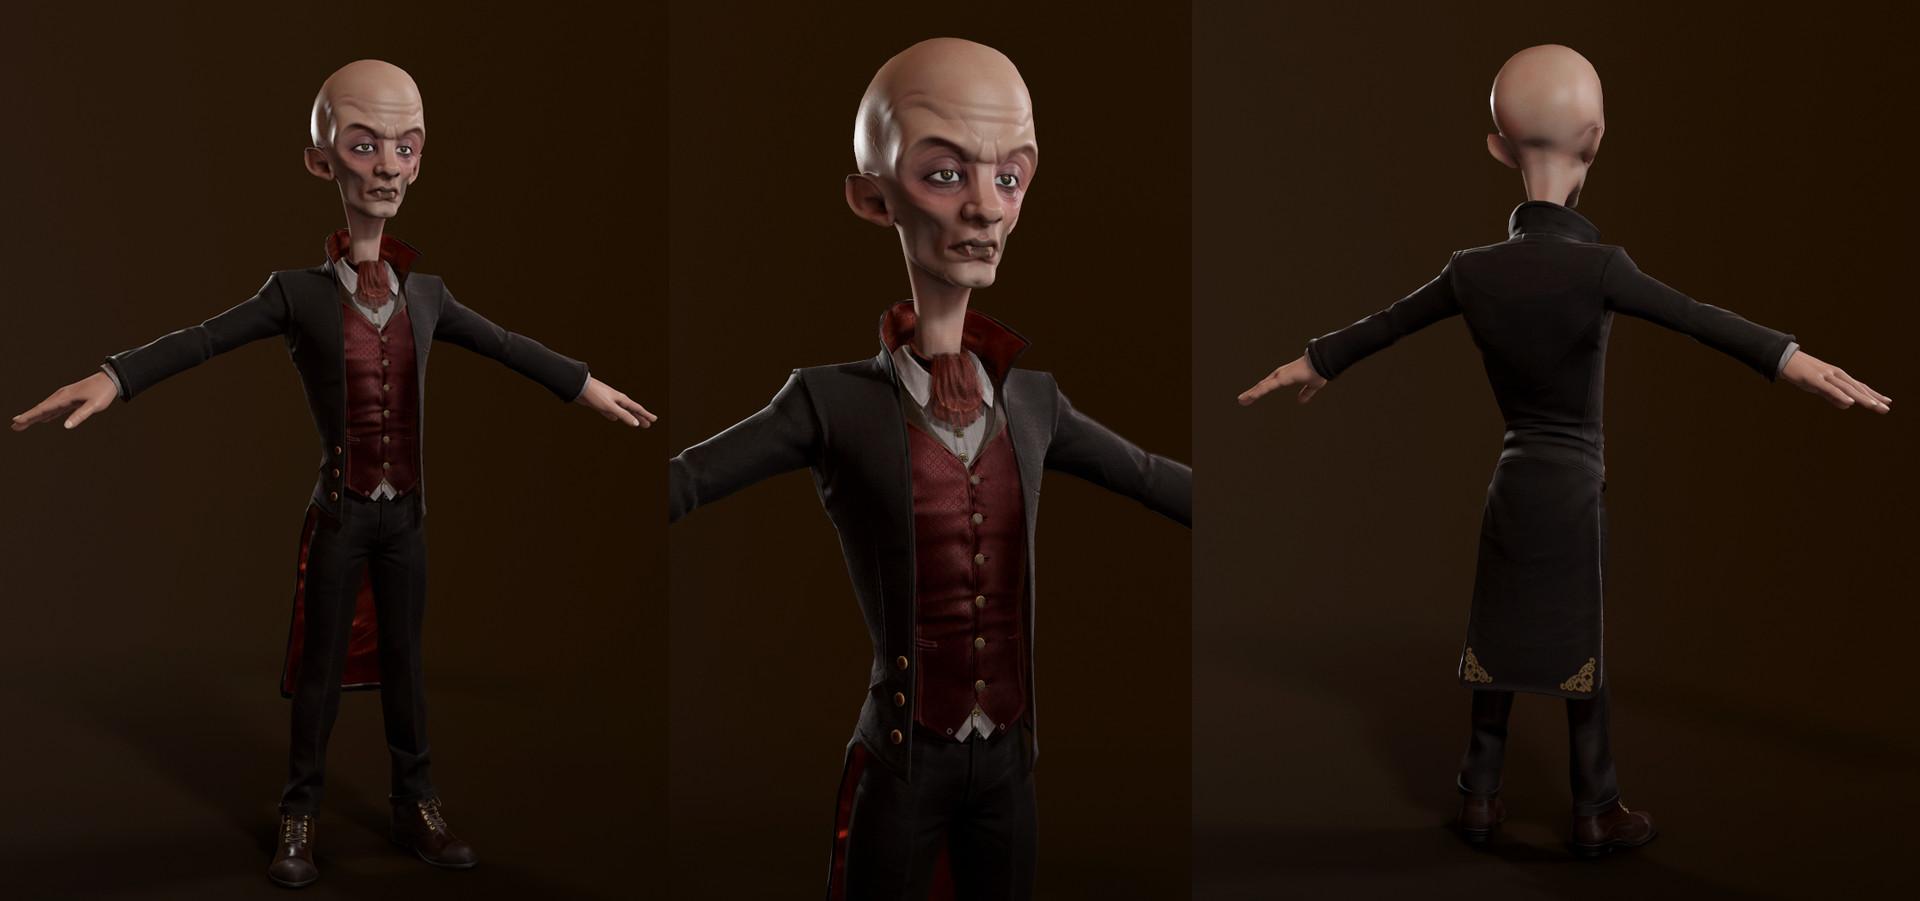 Realtime Cartoon Vampire